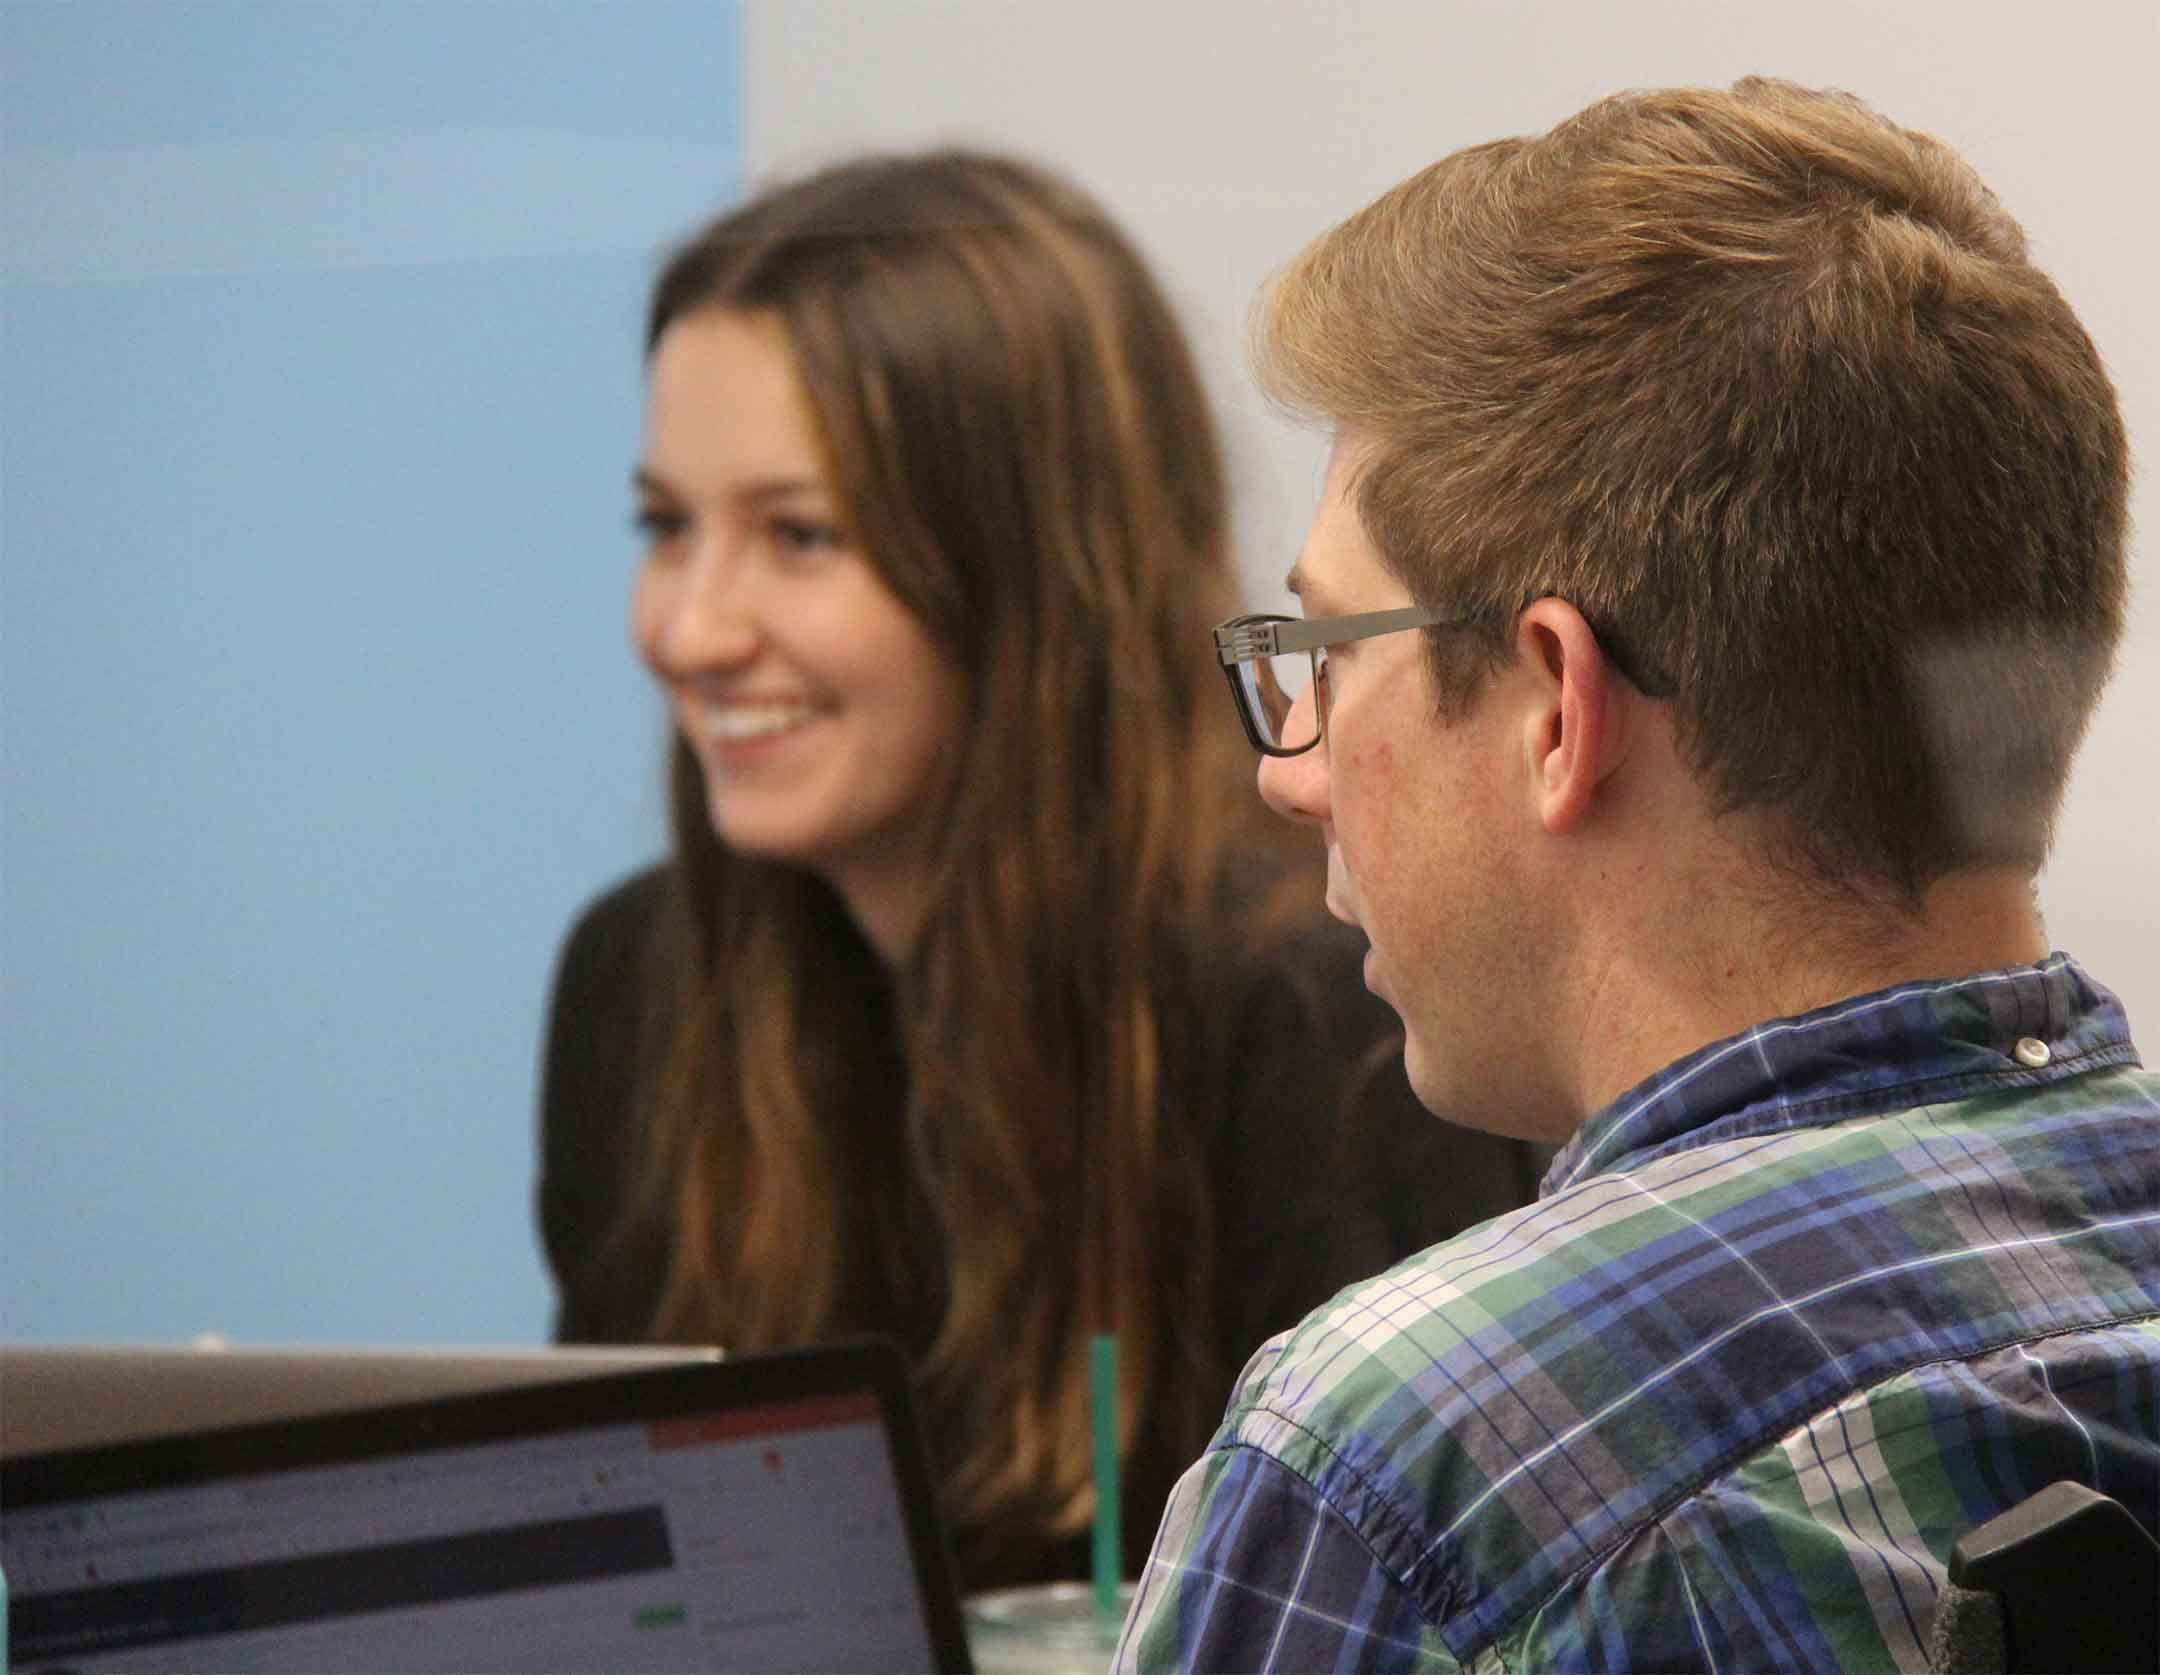 Zac Heinrichs and Kat Shereko working at Portent a digital marketing agency in Seattle